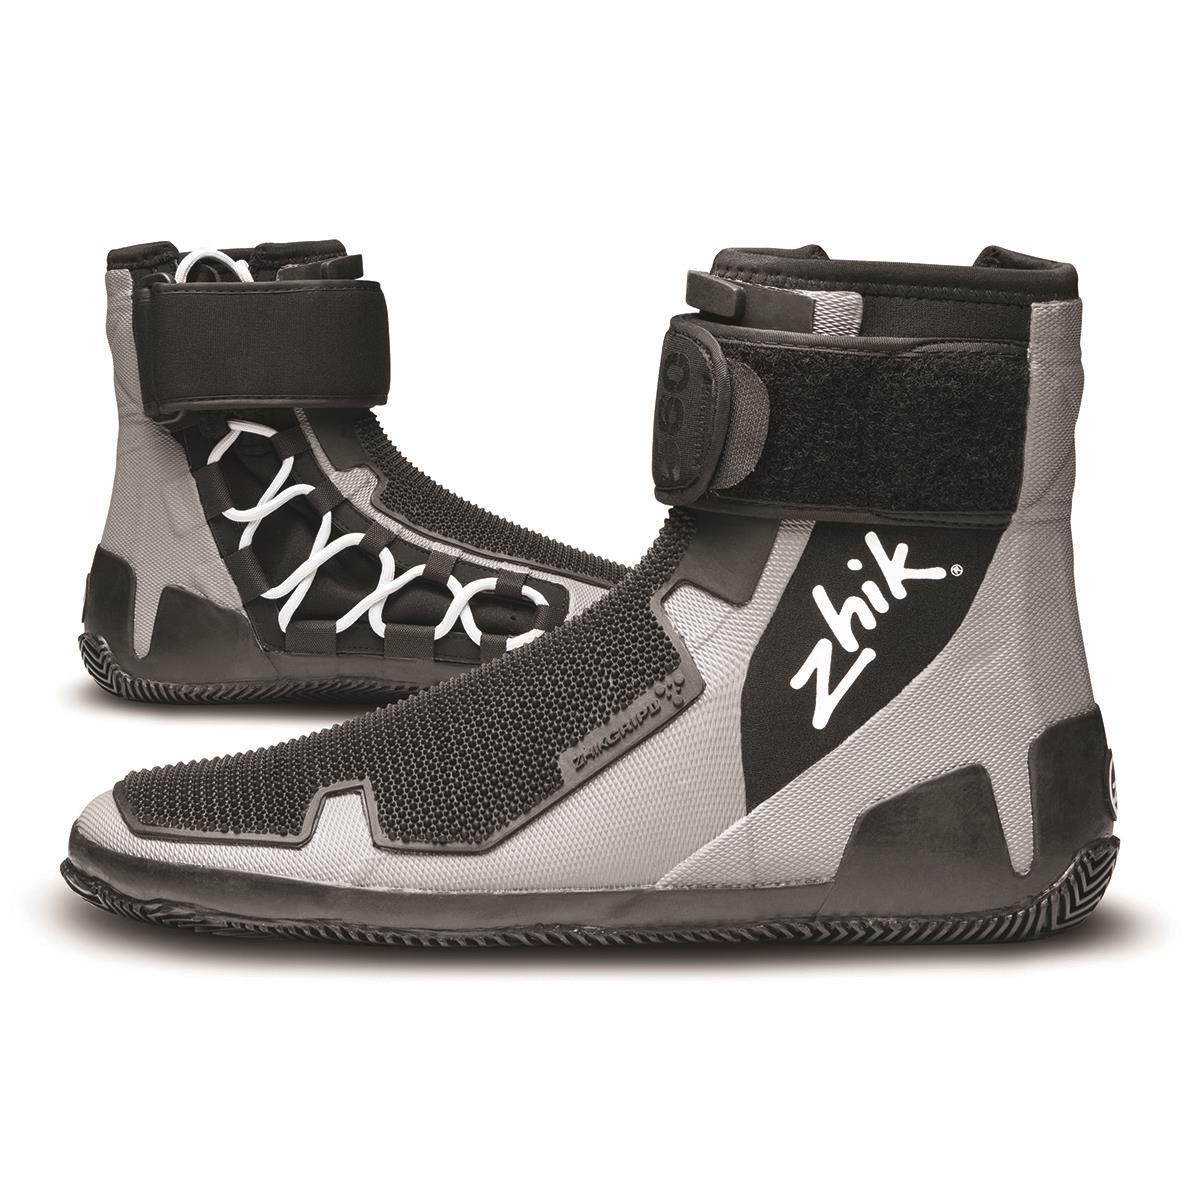 Zhik 560 sailing boots